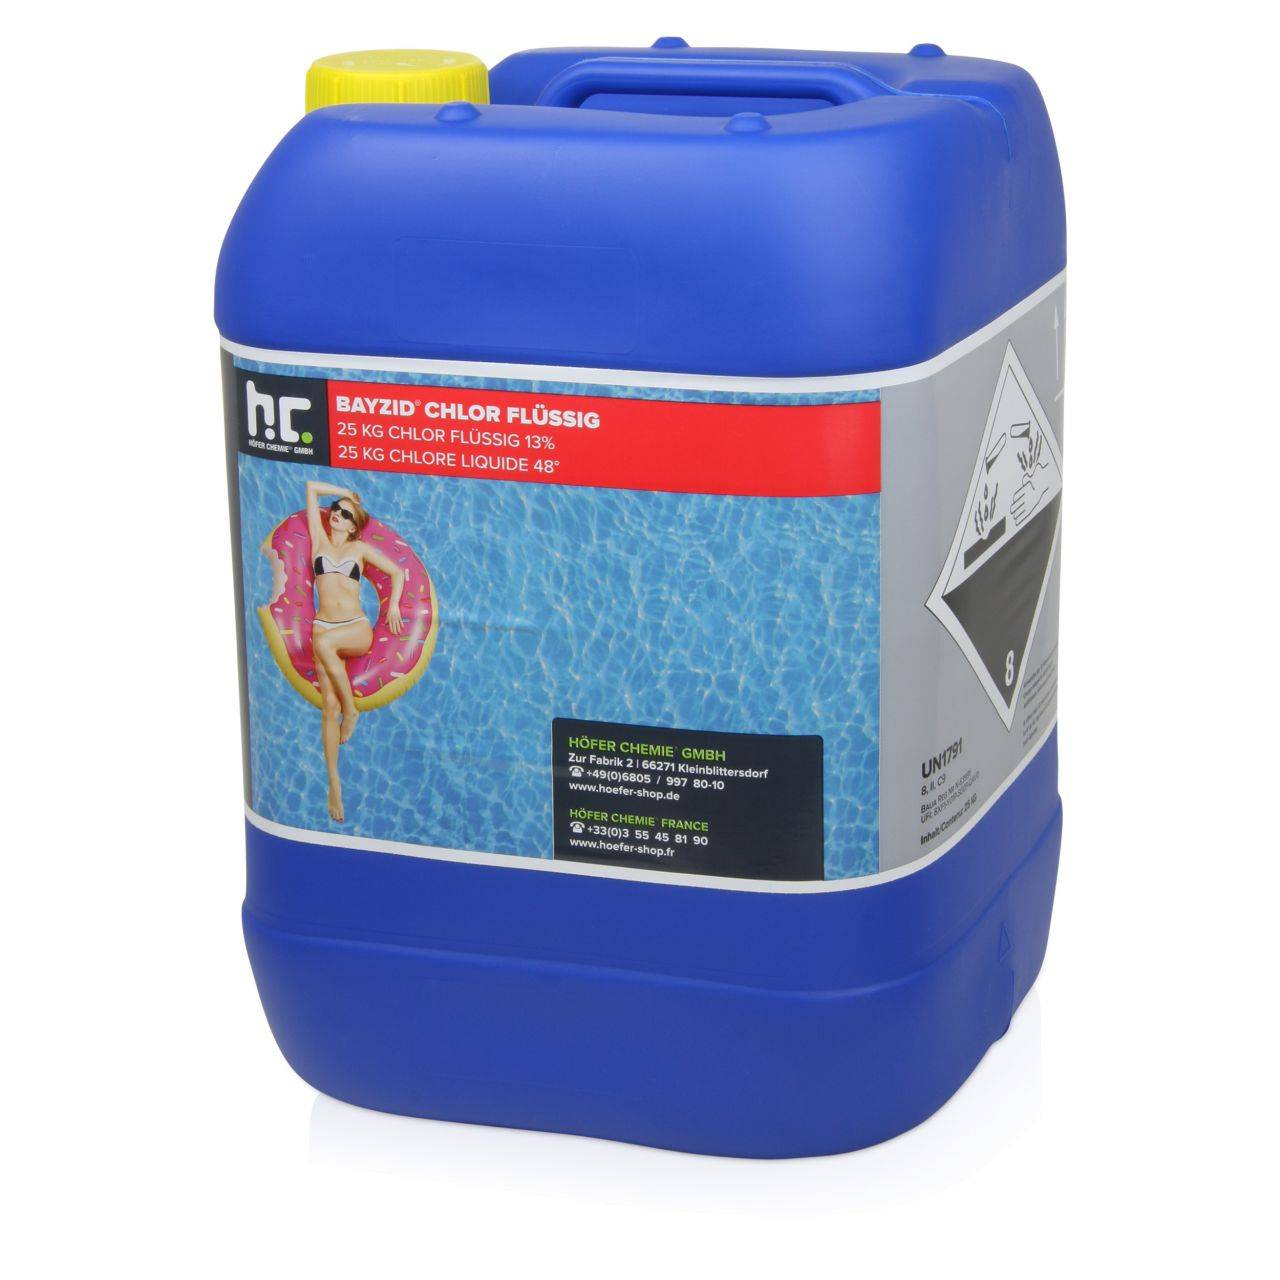 BAYZID 50 kg 20 L) Bayzid® Chlore liquide 48° (2 x 25 kg)